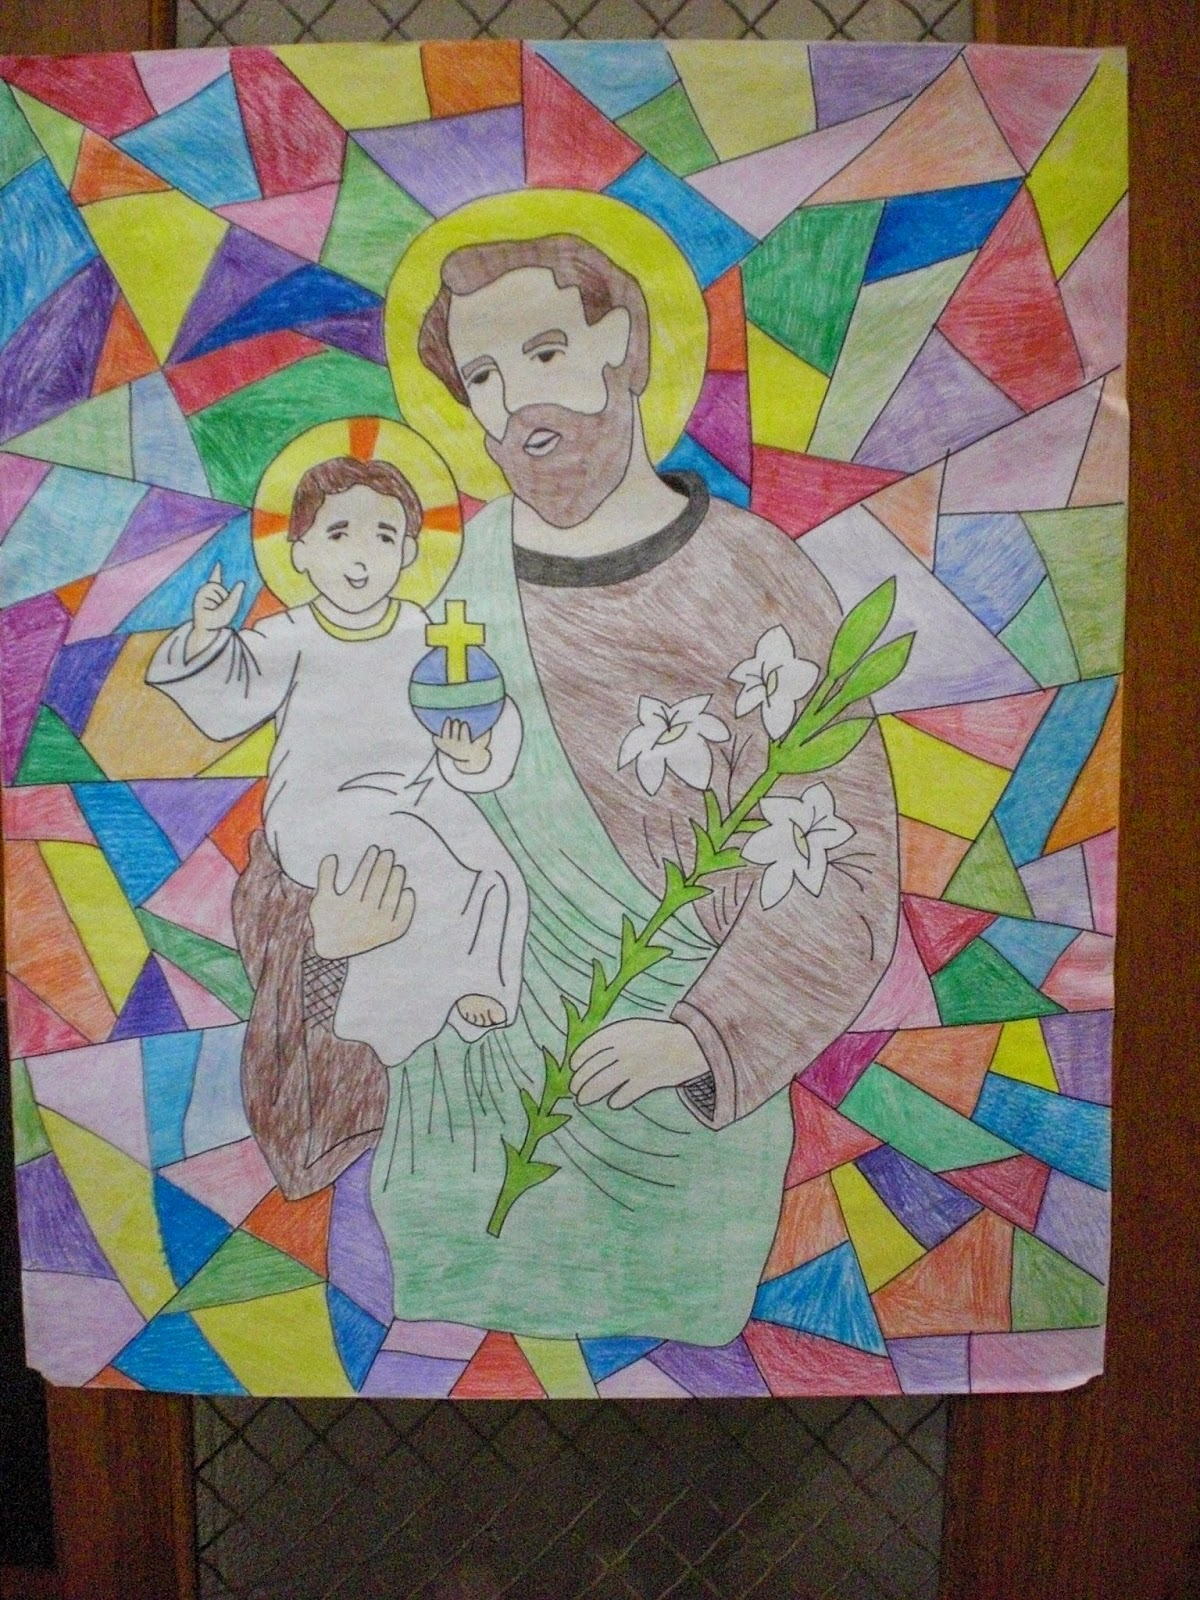 http://looktohimandberadiant.blogspot.com/2014/03/happy-st-joseph-day.html